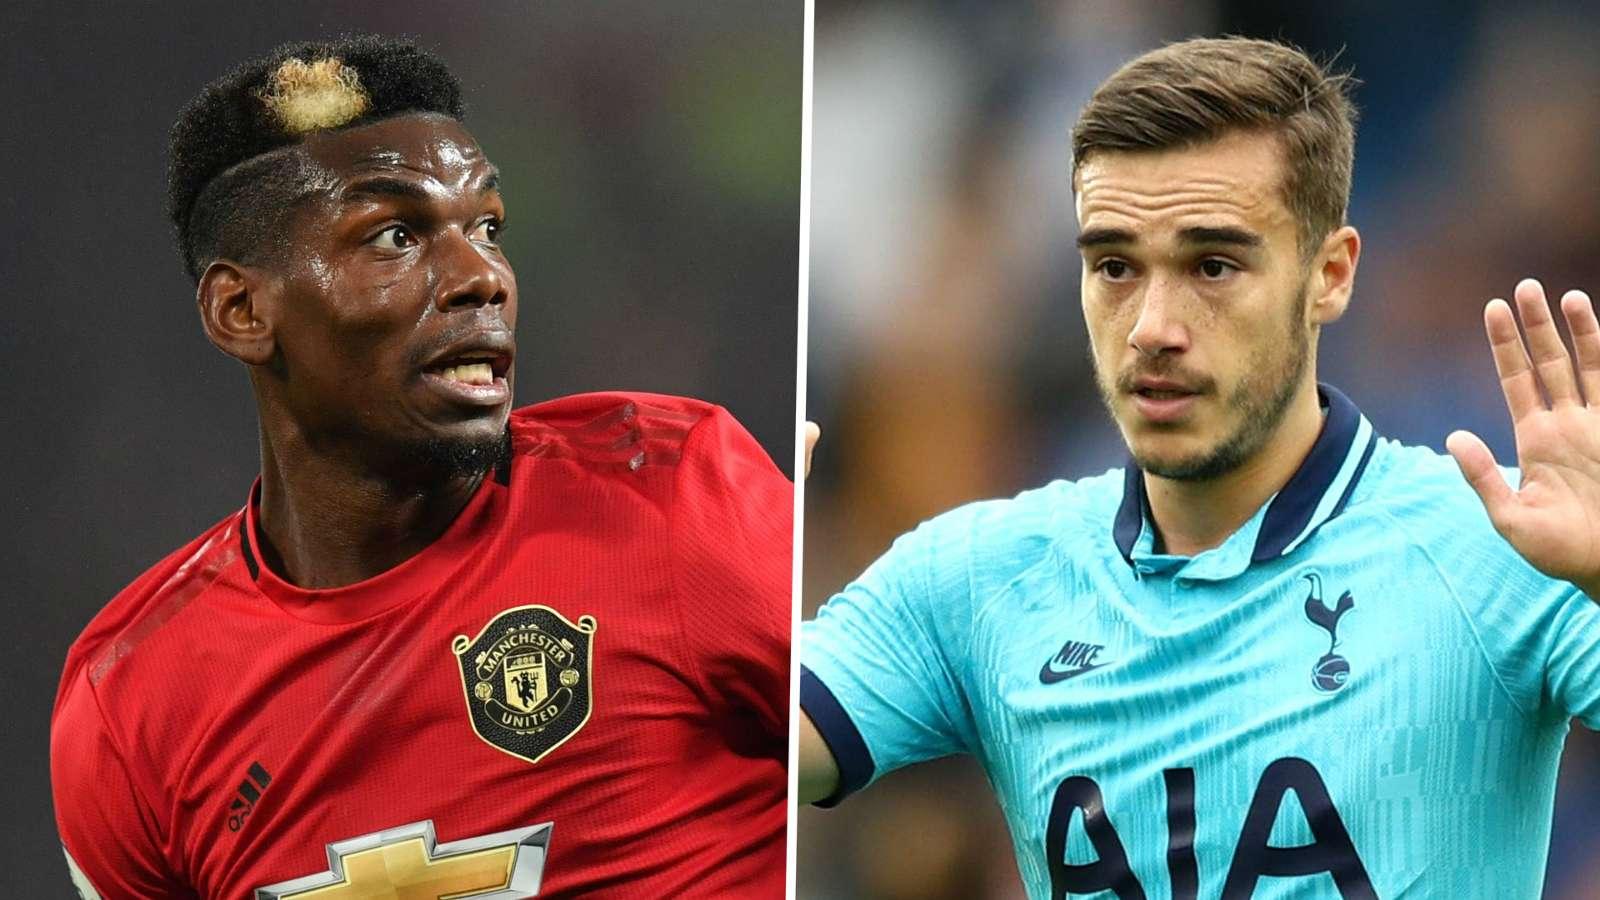 Paul Pogba Harry Winks Manchester United Tottenham 2019-20